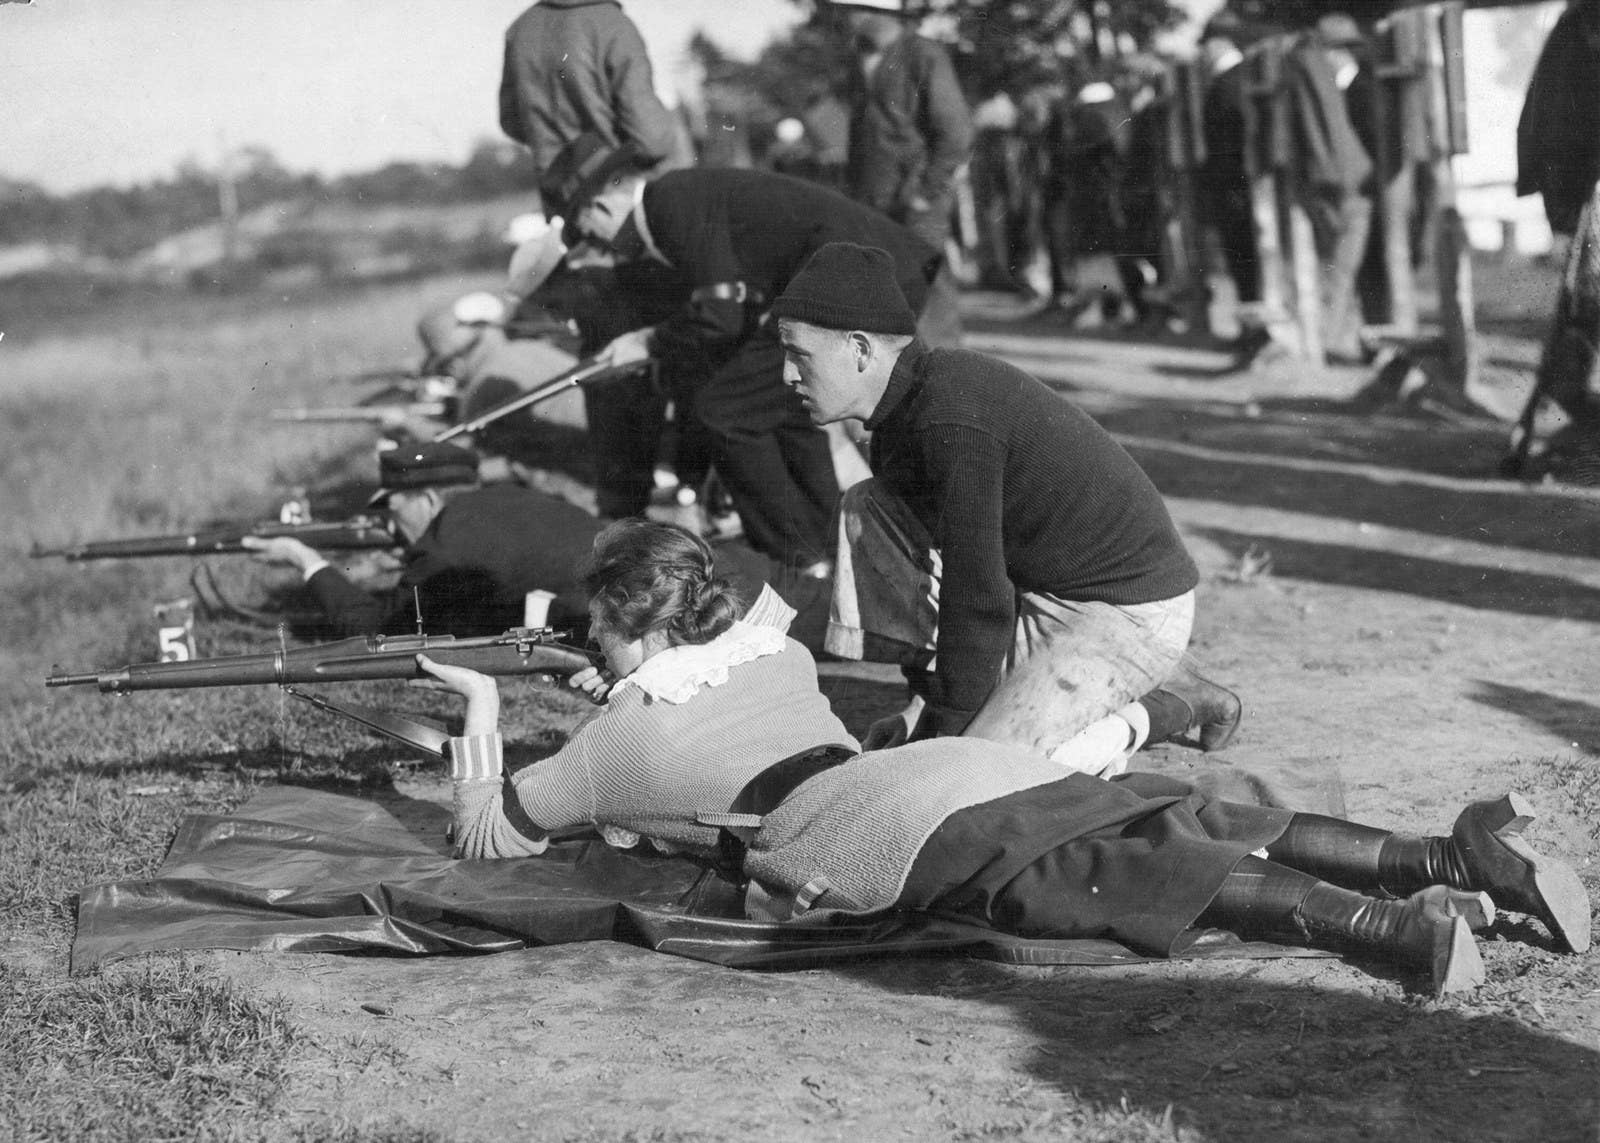 Target practice in Wakefield, Massachusetts, circa 1916.